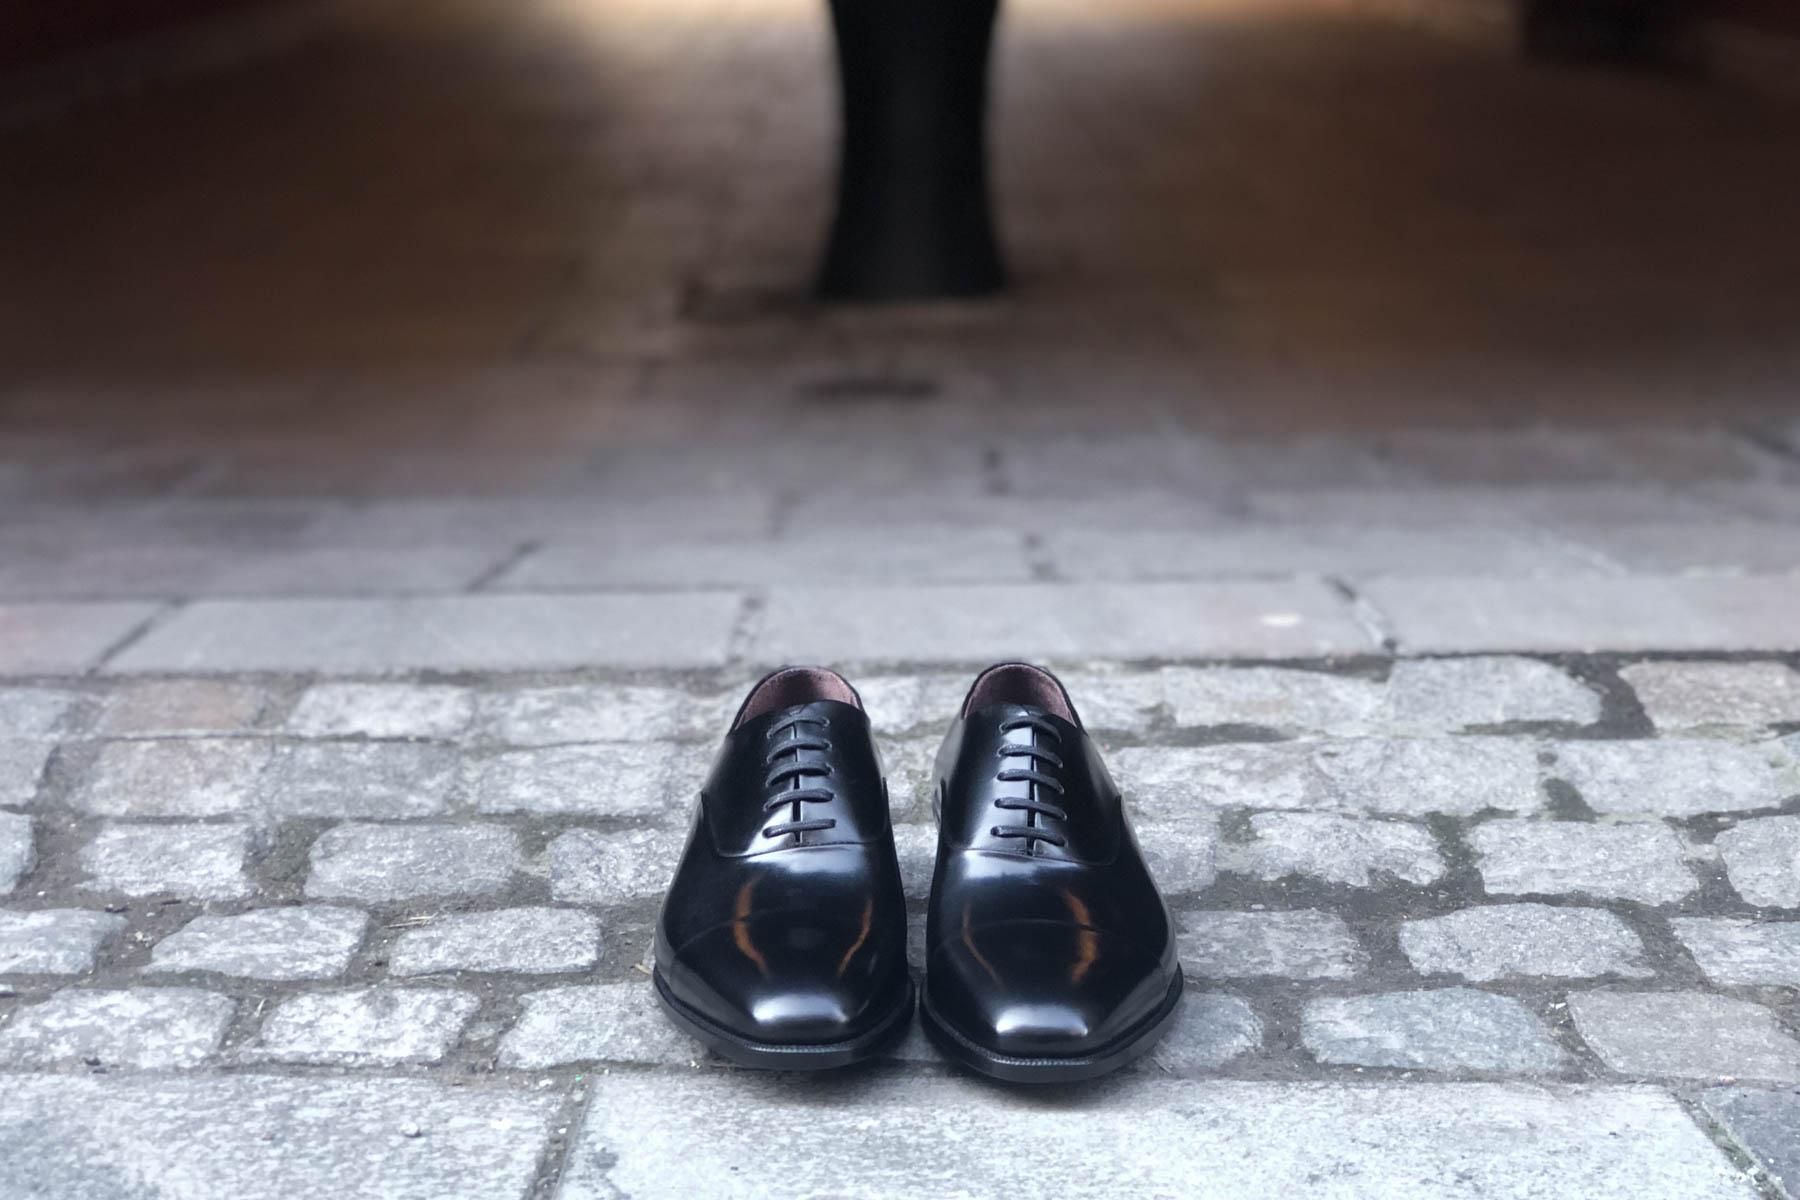 Best Looking Black Oxford - Carlos Santos 9899 Handgrade Oxford in Black Calf for The Noble Shoe 2